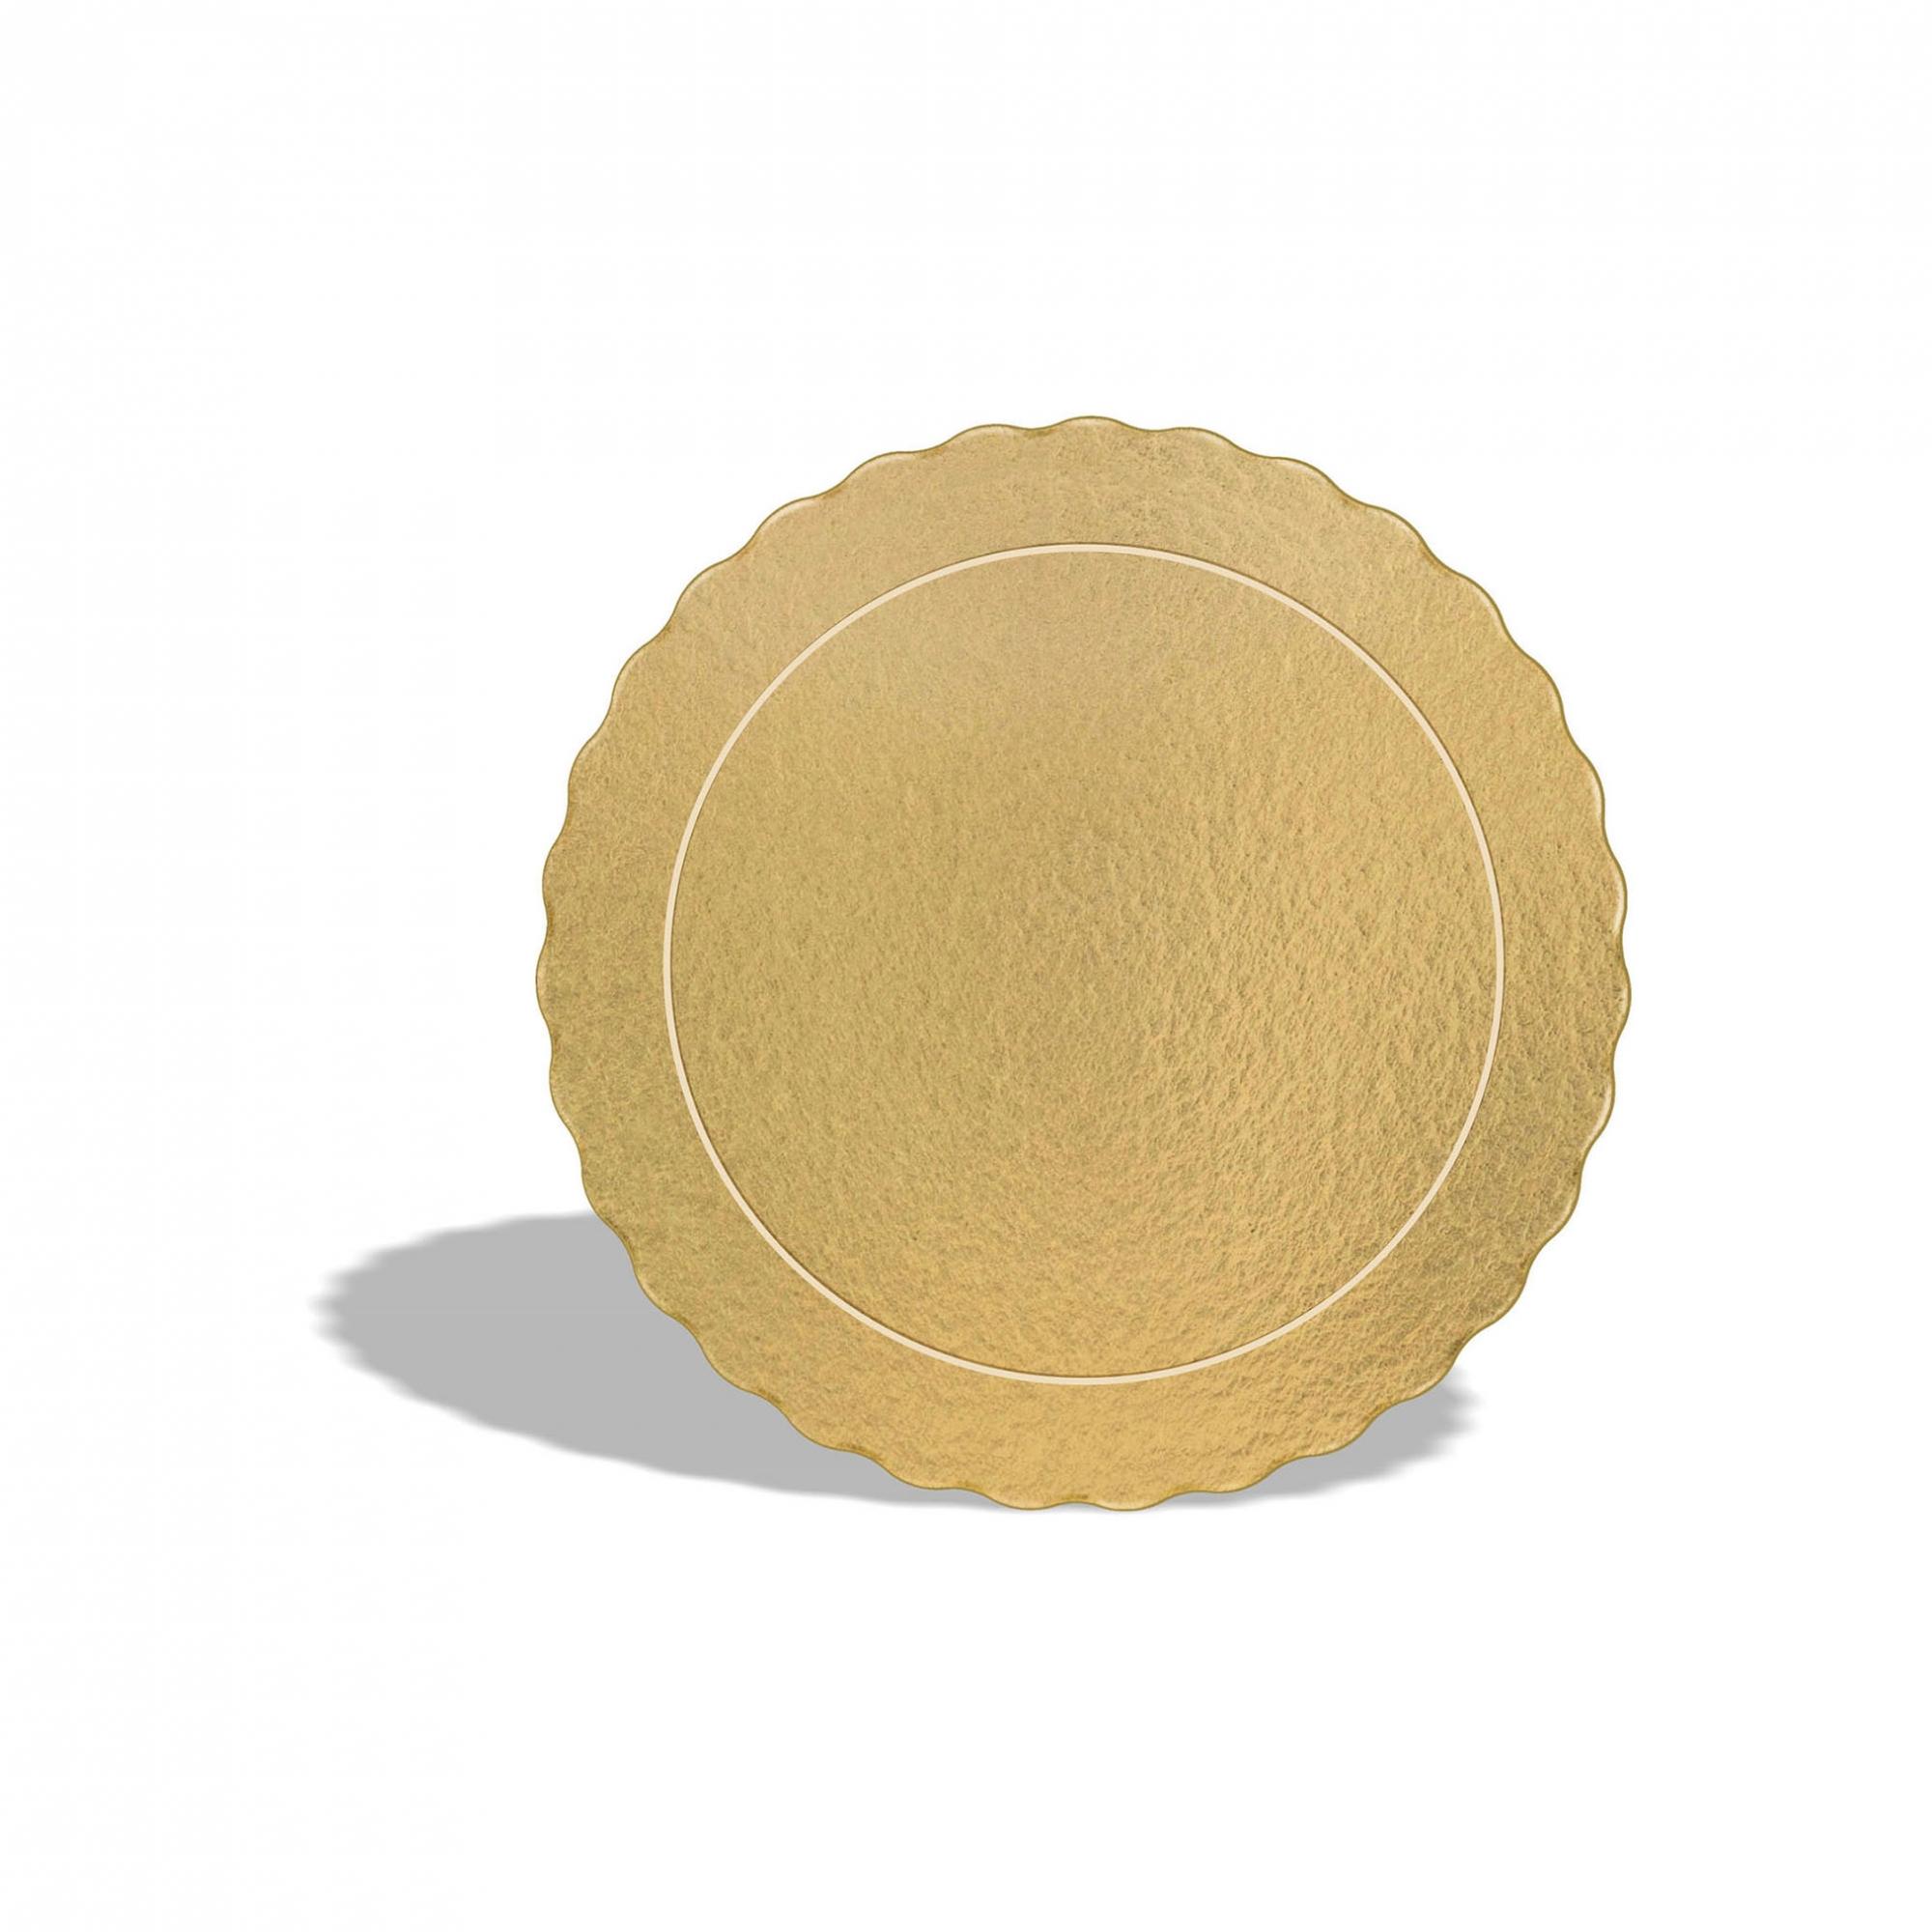 50 Bases Laminadas, Suporte P/ Bolo, 17cm - Ouro